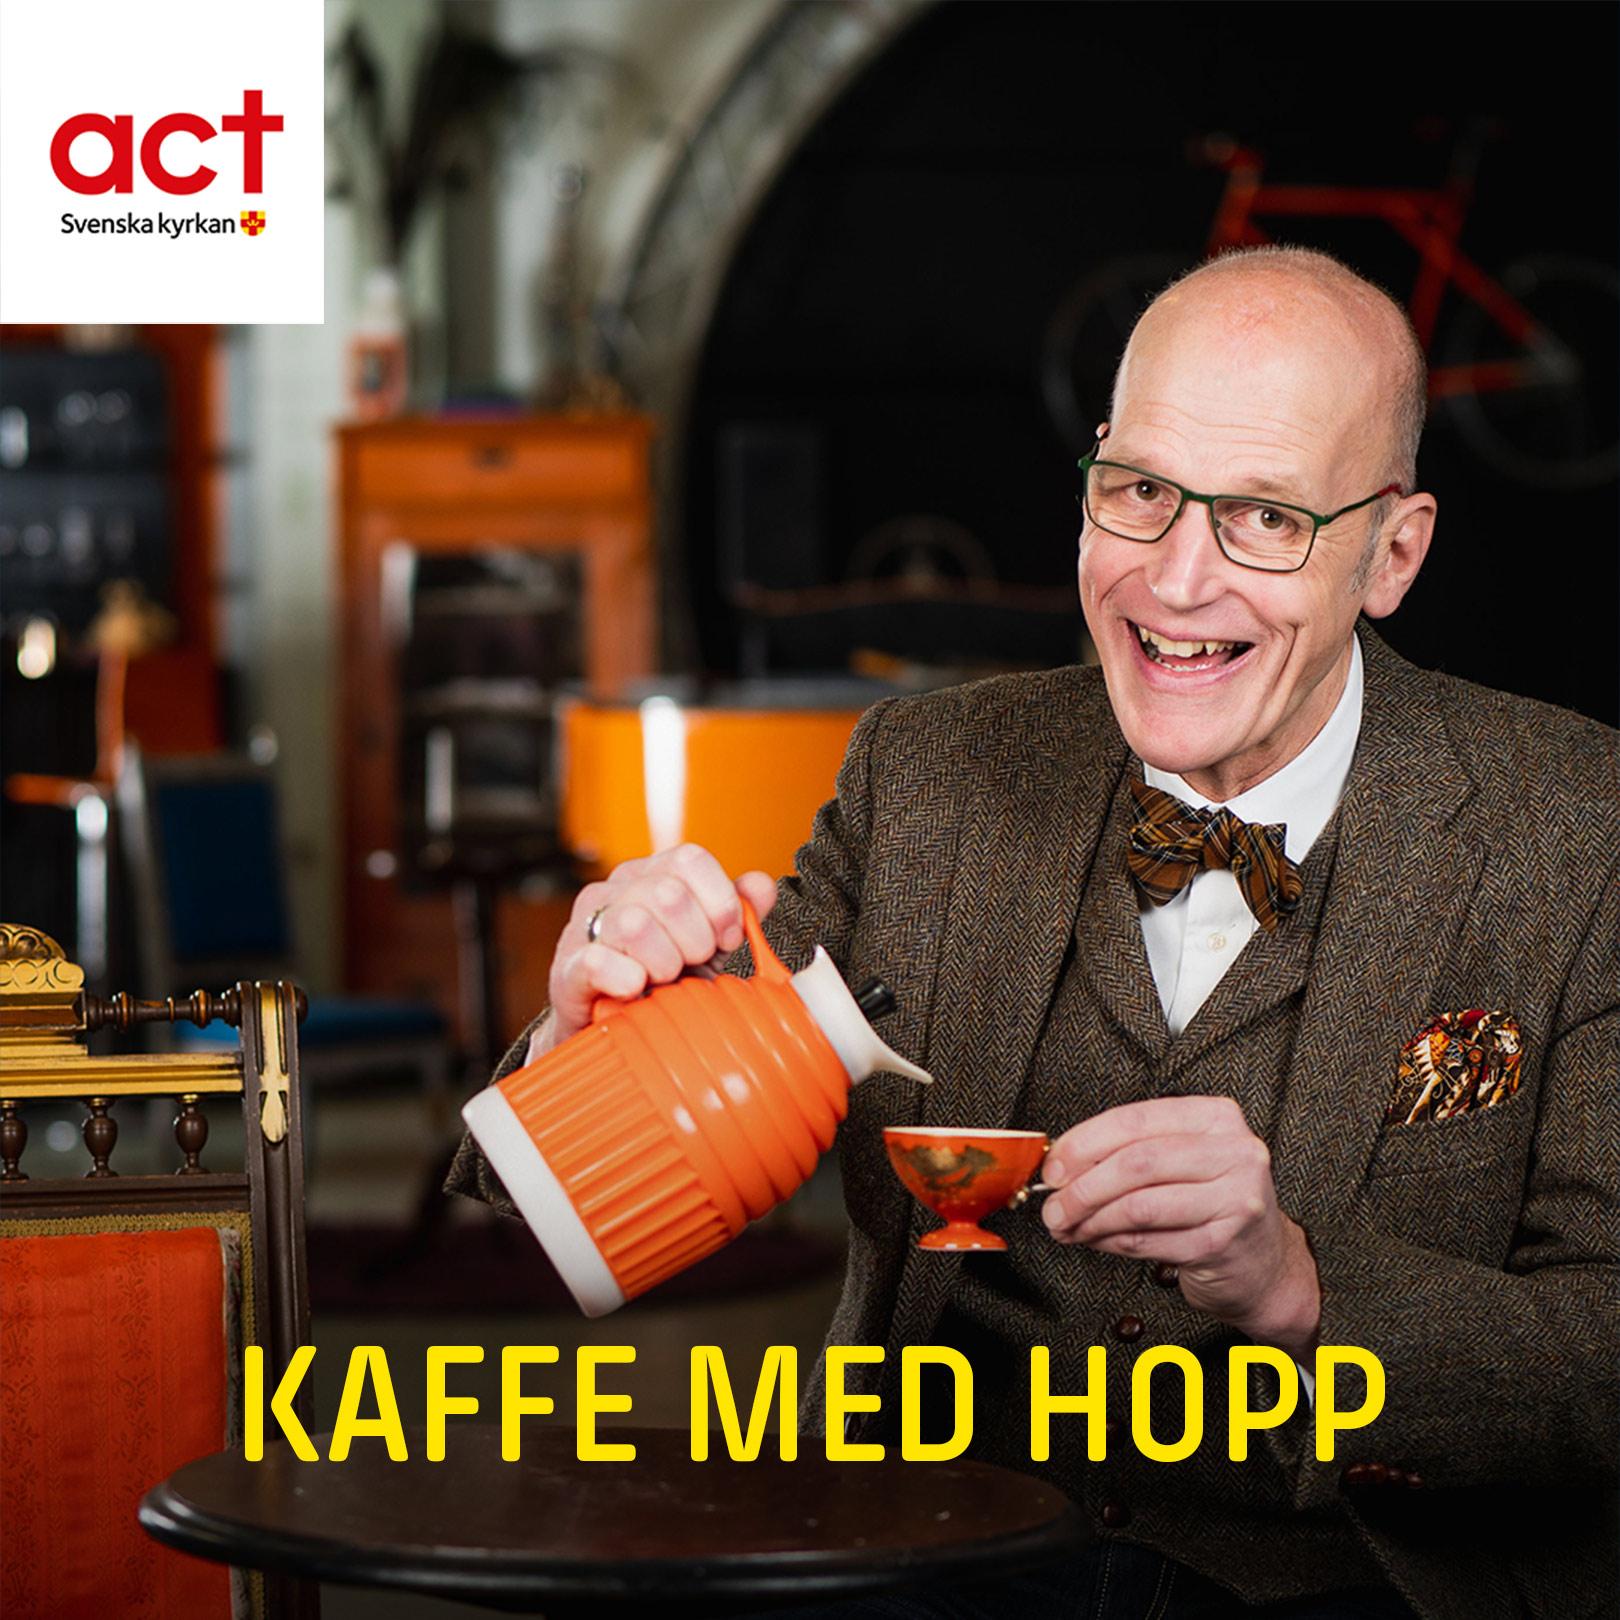 Kaffe med hopp show art